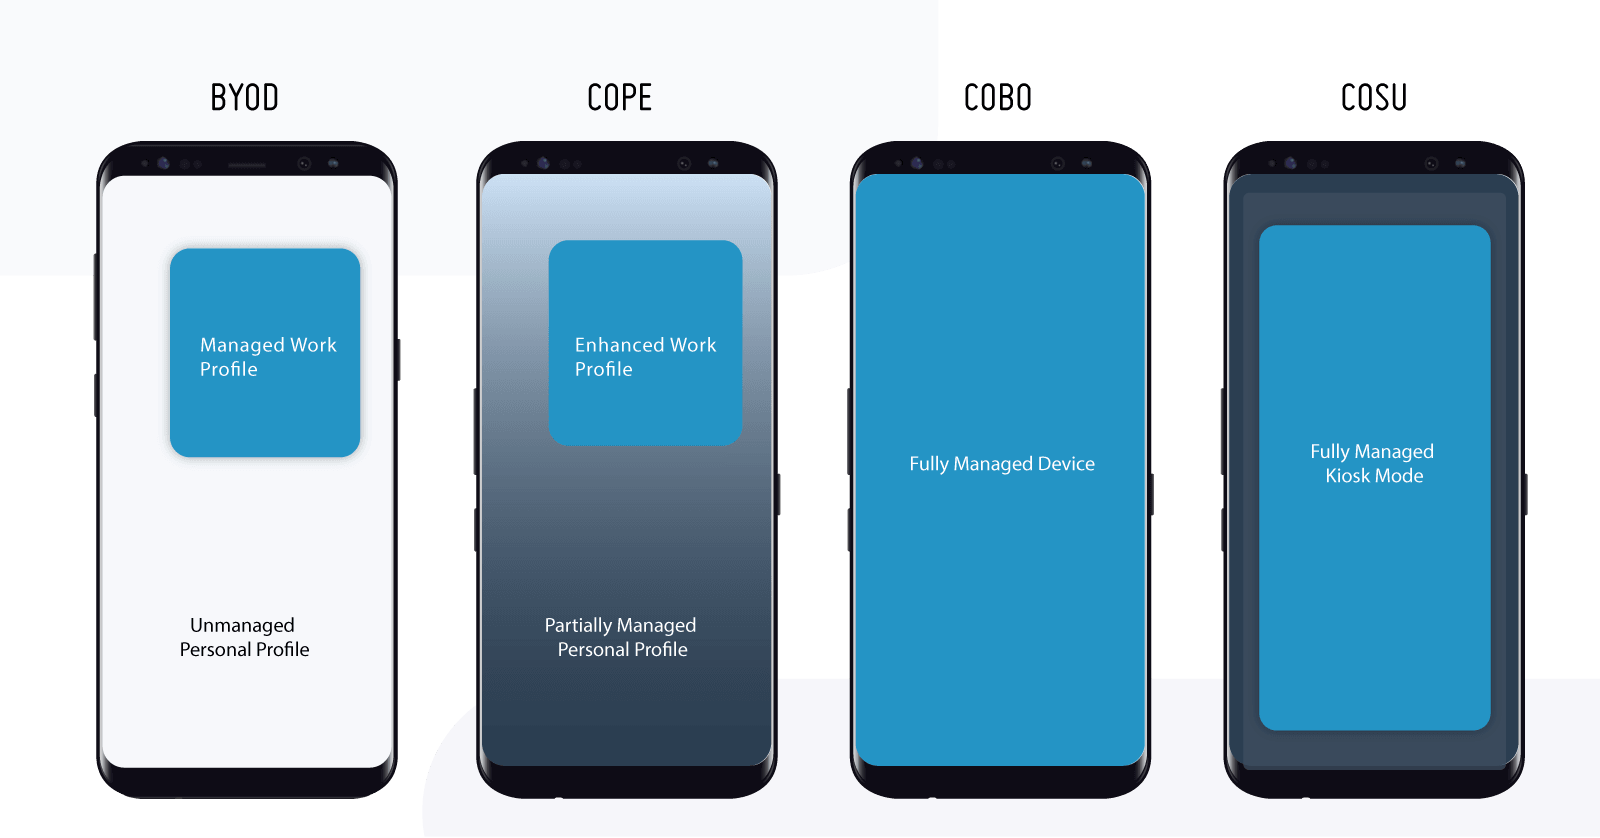 Beratung_Android BYOD-COPE-COBO-CUSO im Vergleich